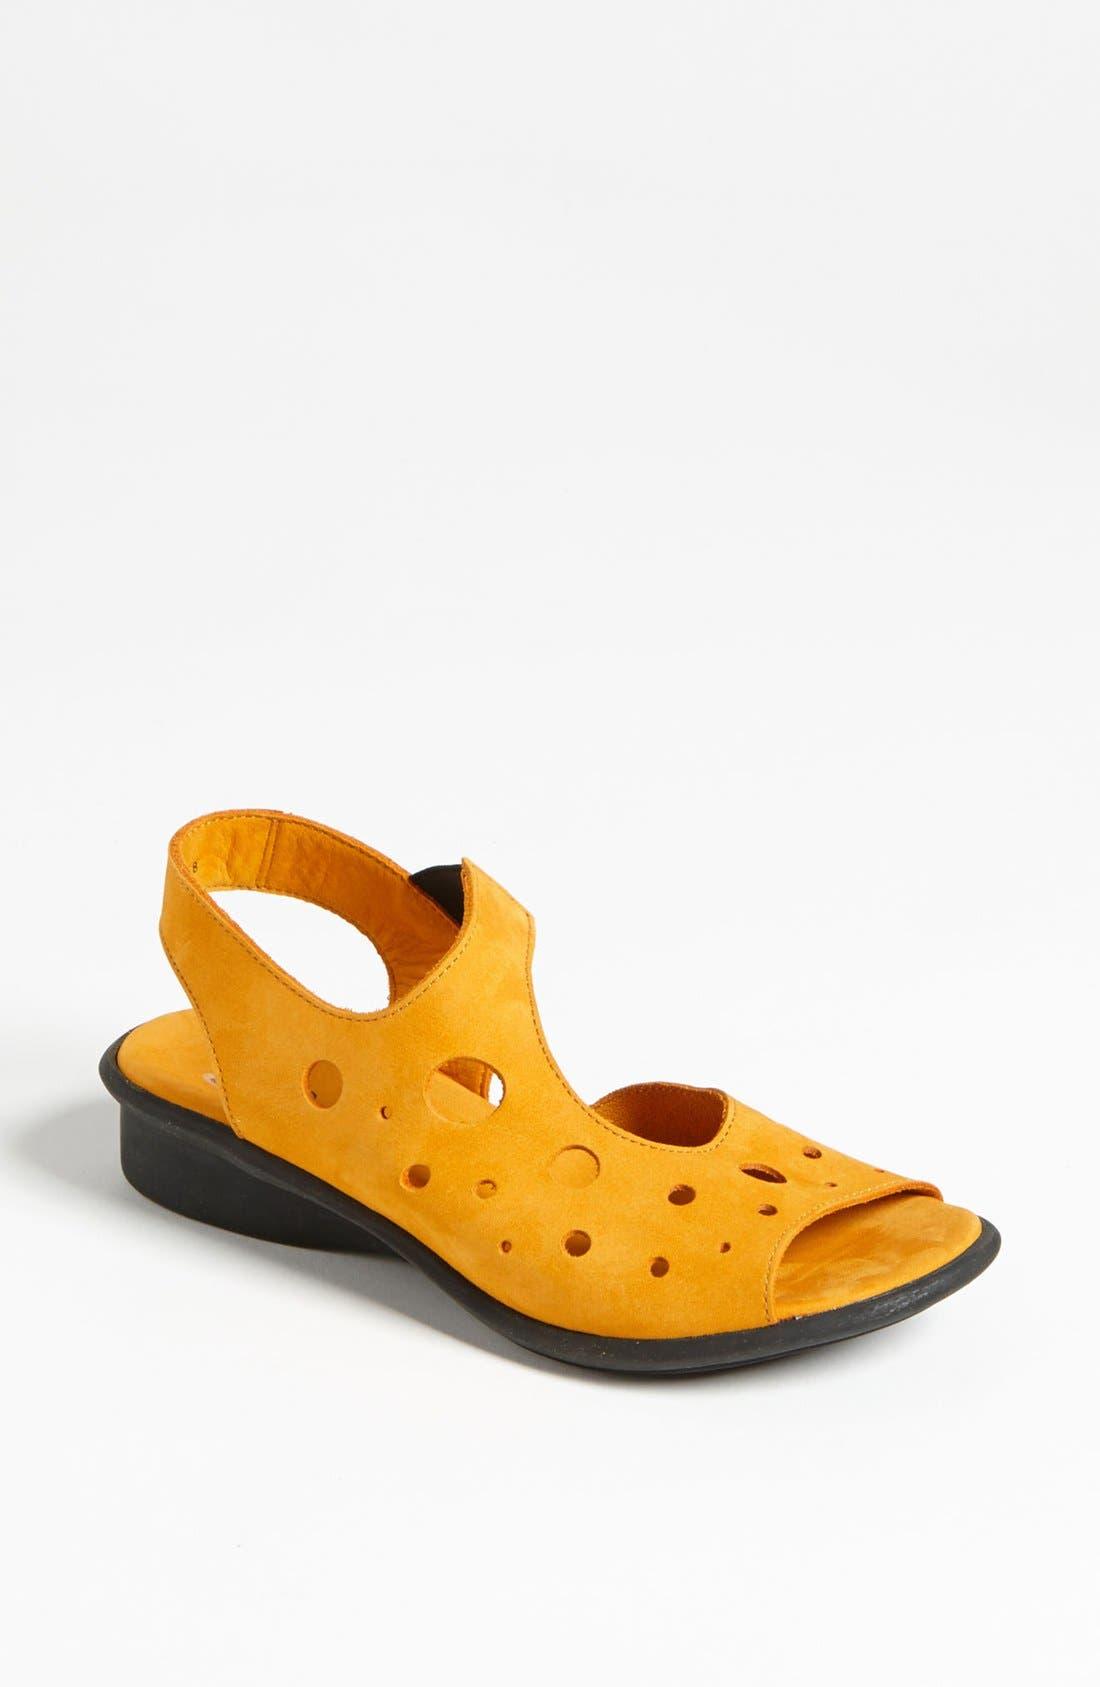 Alternate Image 1 Selected - Arche 'Sally' Sandal